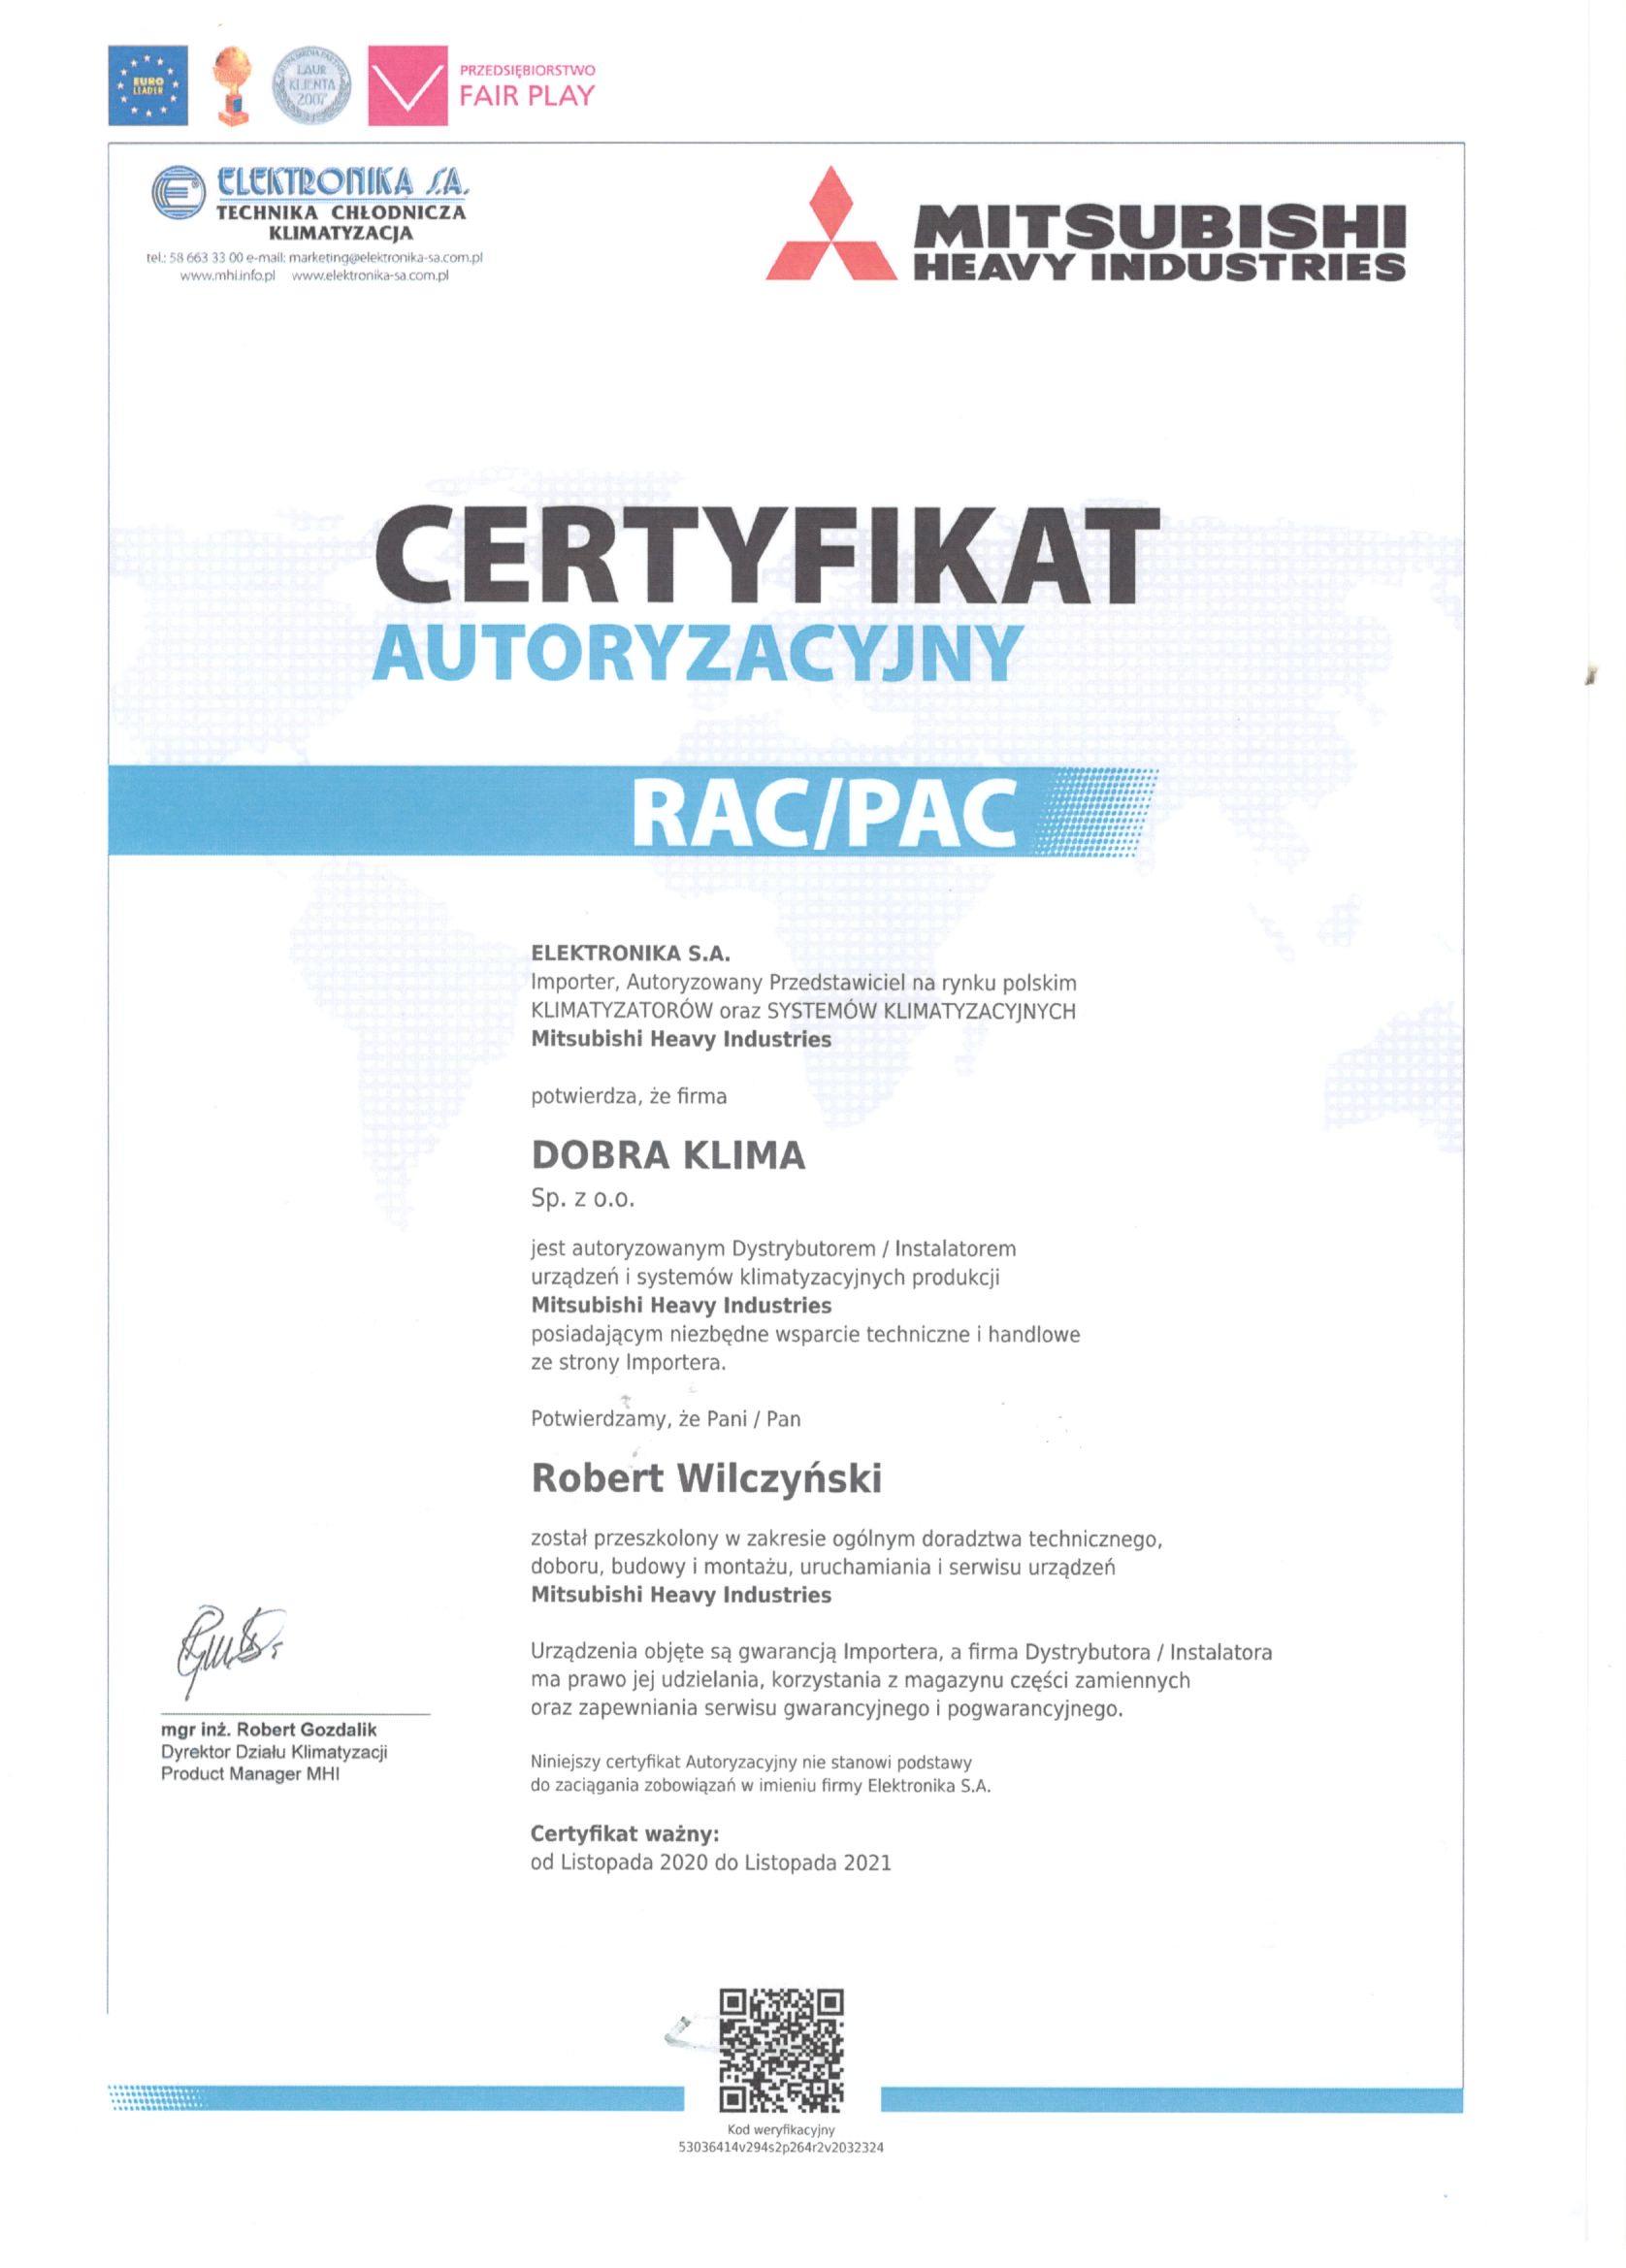 2020-certyfikat-mitsubishi-robert-wilczynski